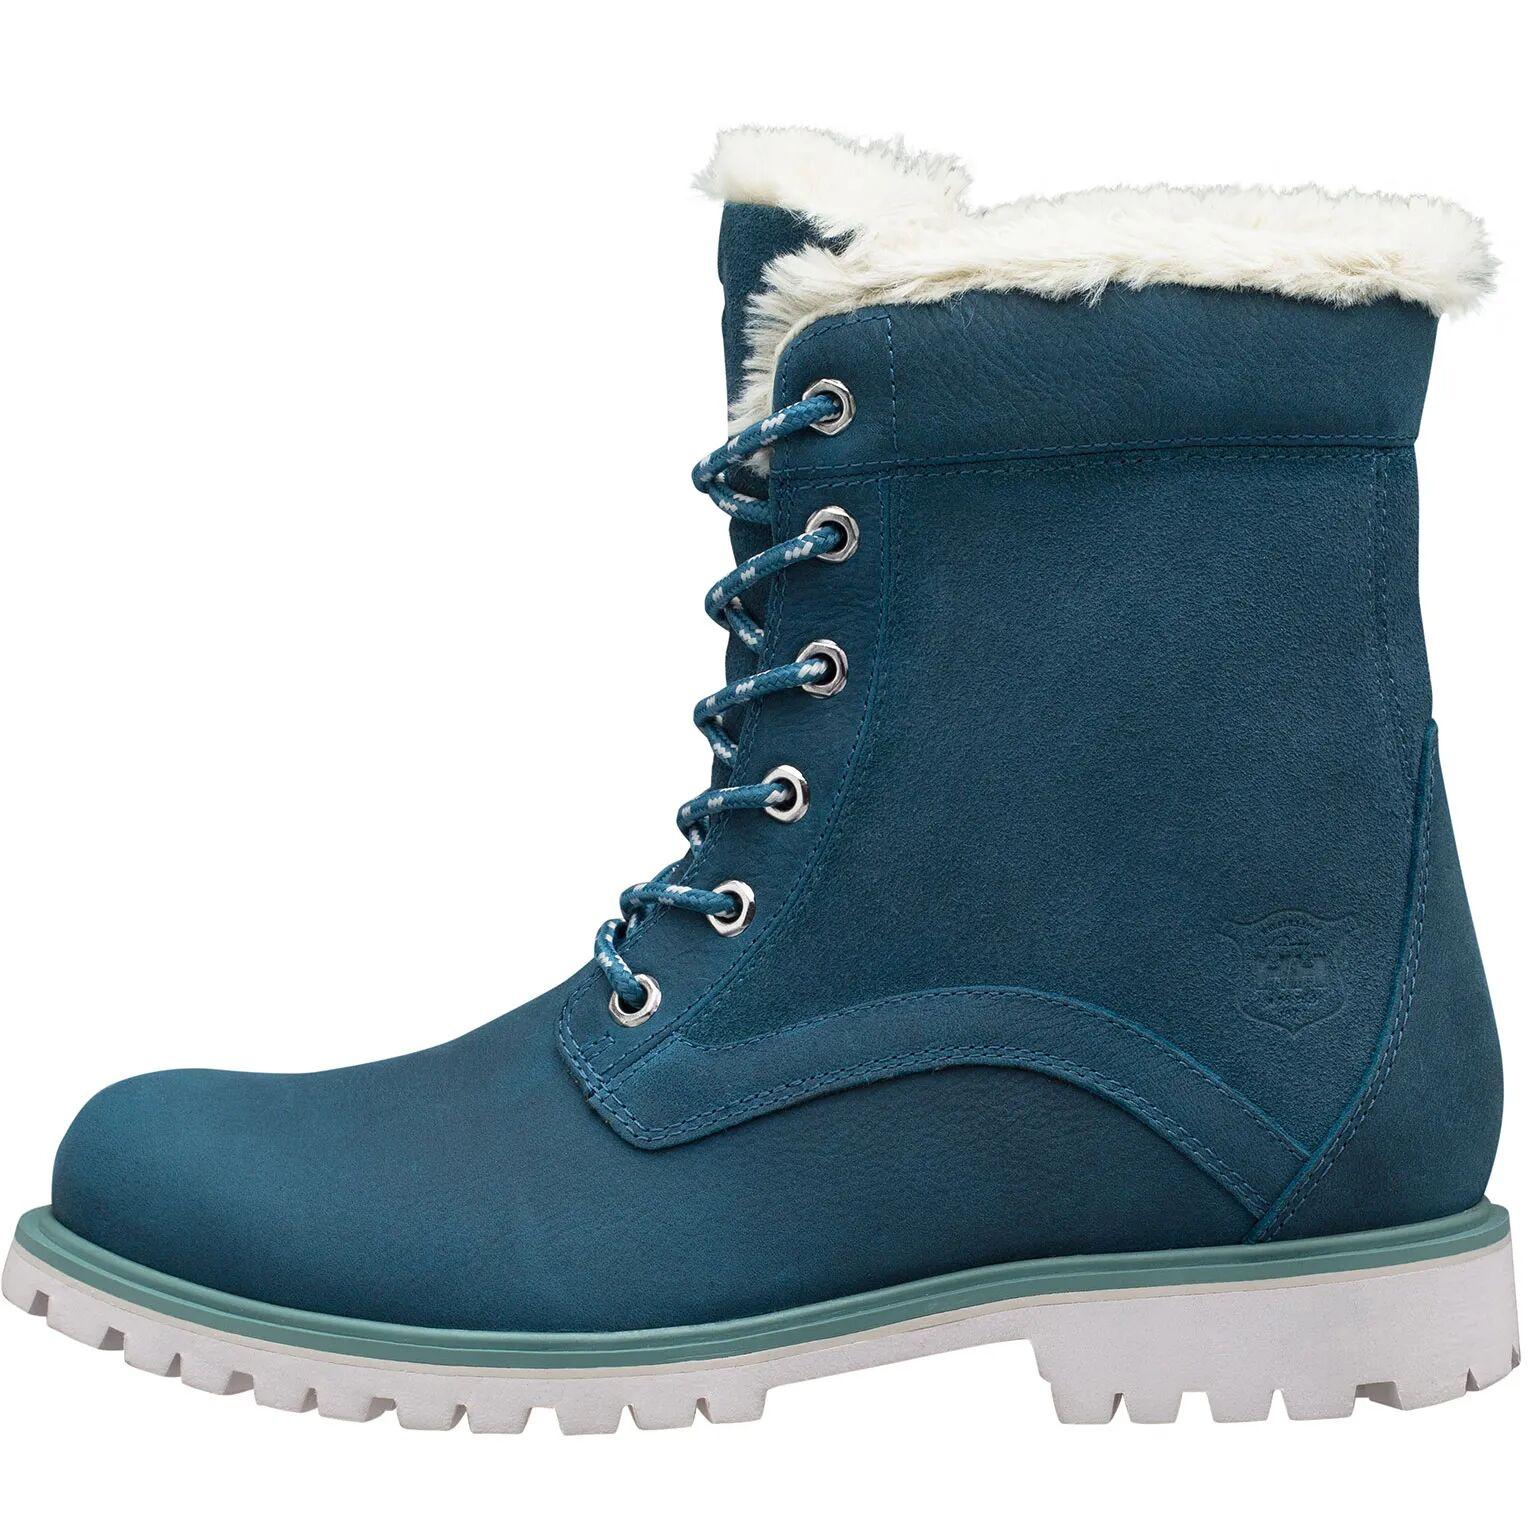 Helly Hansen W Marion Womens Winter Boot Blue 37.5/6.5